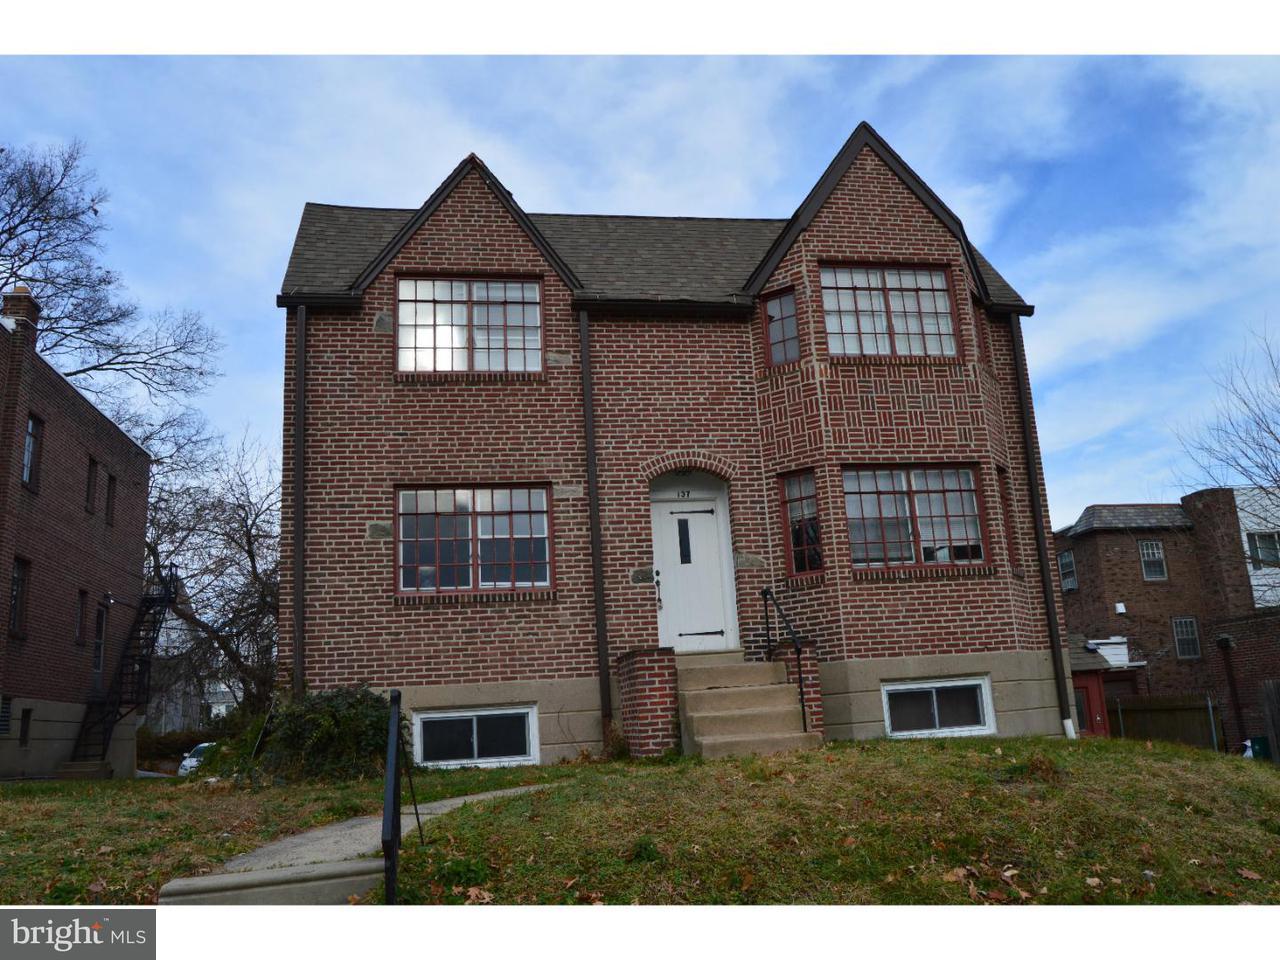 Quadraplex 为 出租 在 137 BERKLEY AVE #D Lansdowne, 宾夕法尼亚州 19050 美国